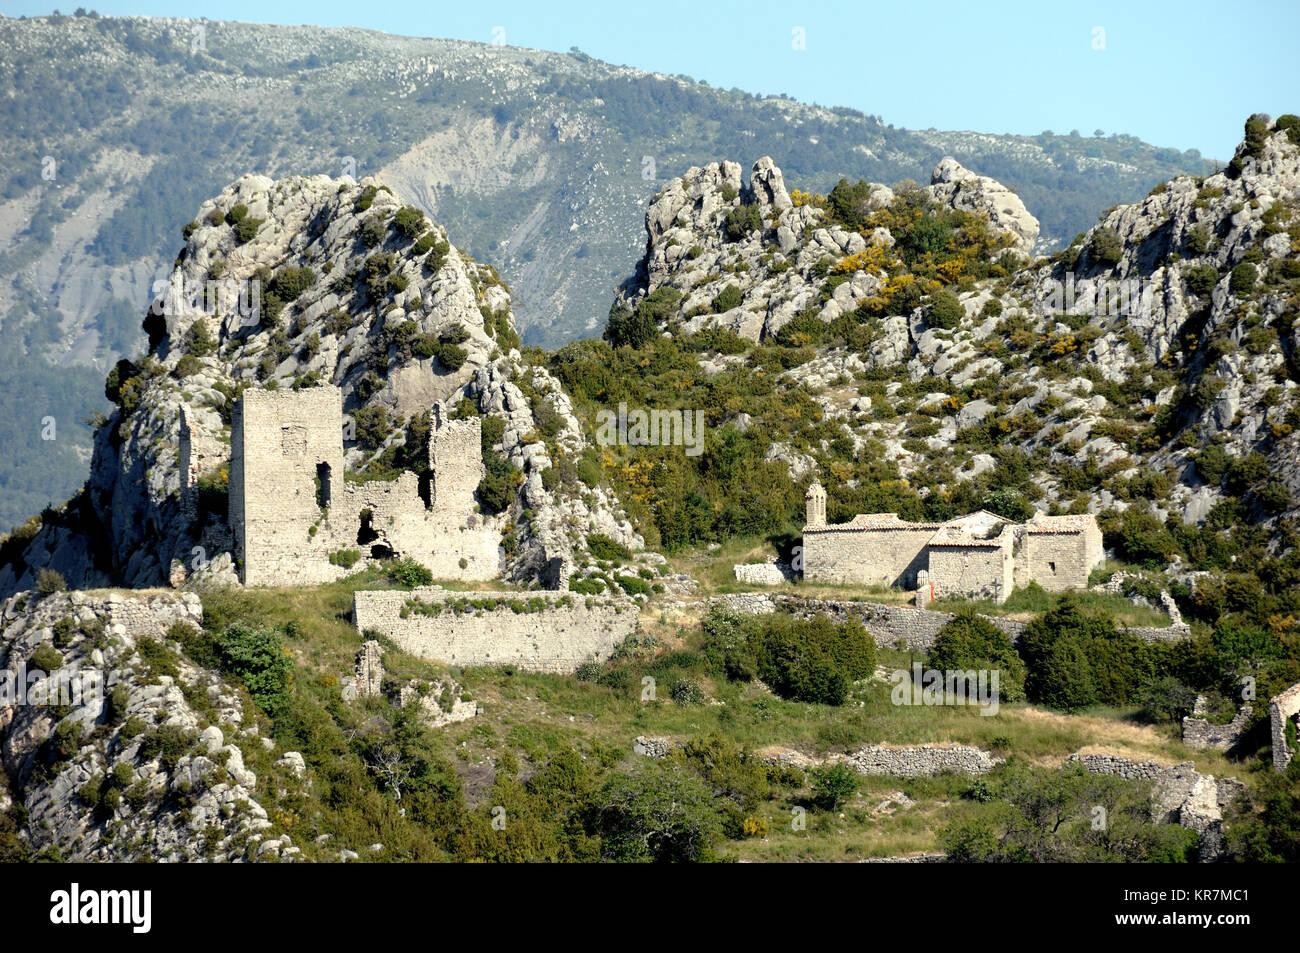 Abandoned Village of la Ville, part of Demandolx Village, with Ruined Medieval Castle above Lake Castillon, near - Stock Image